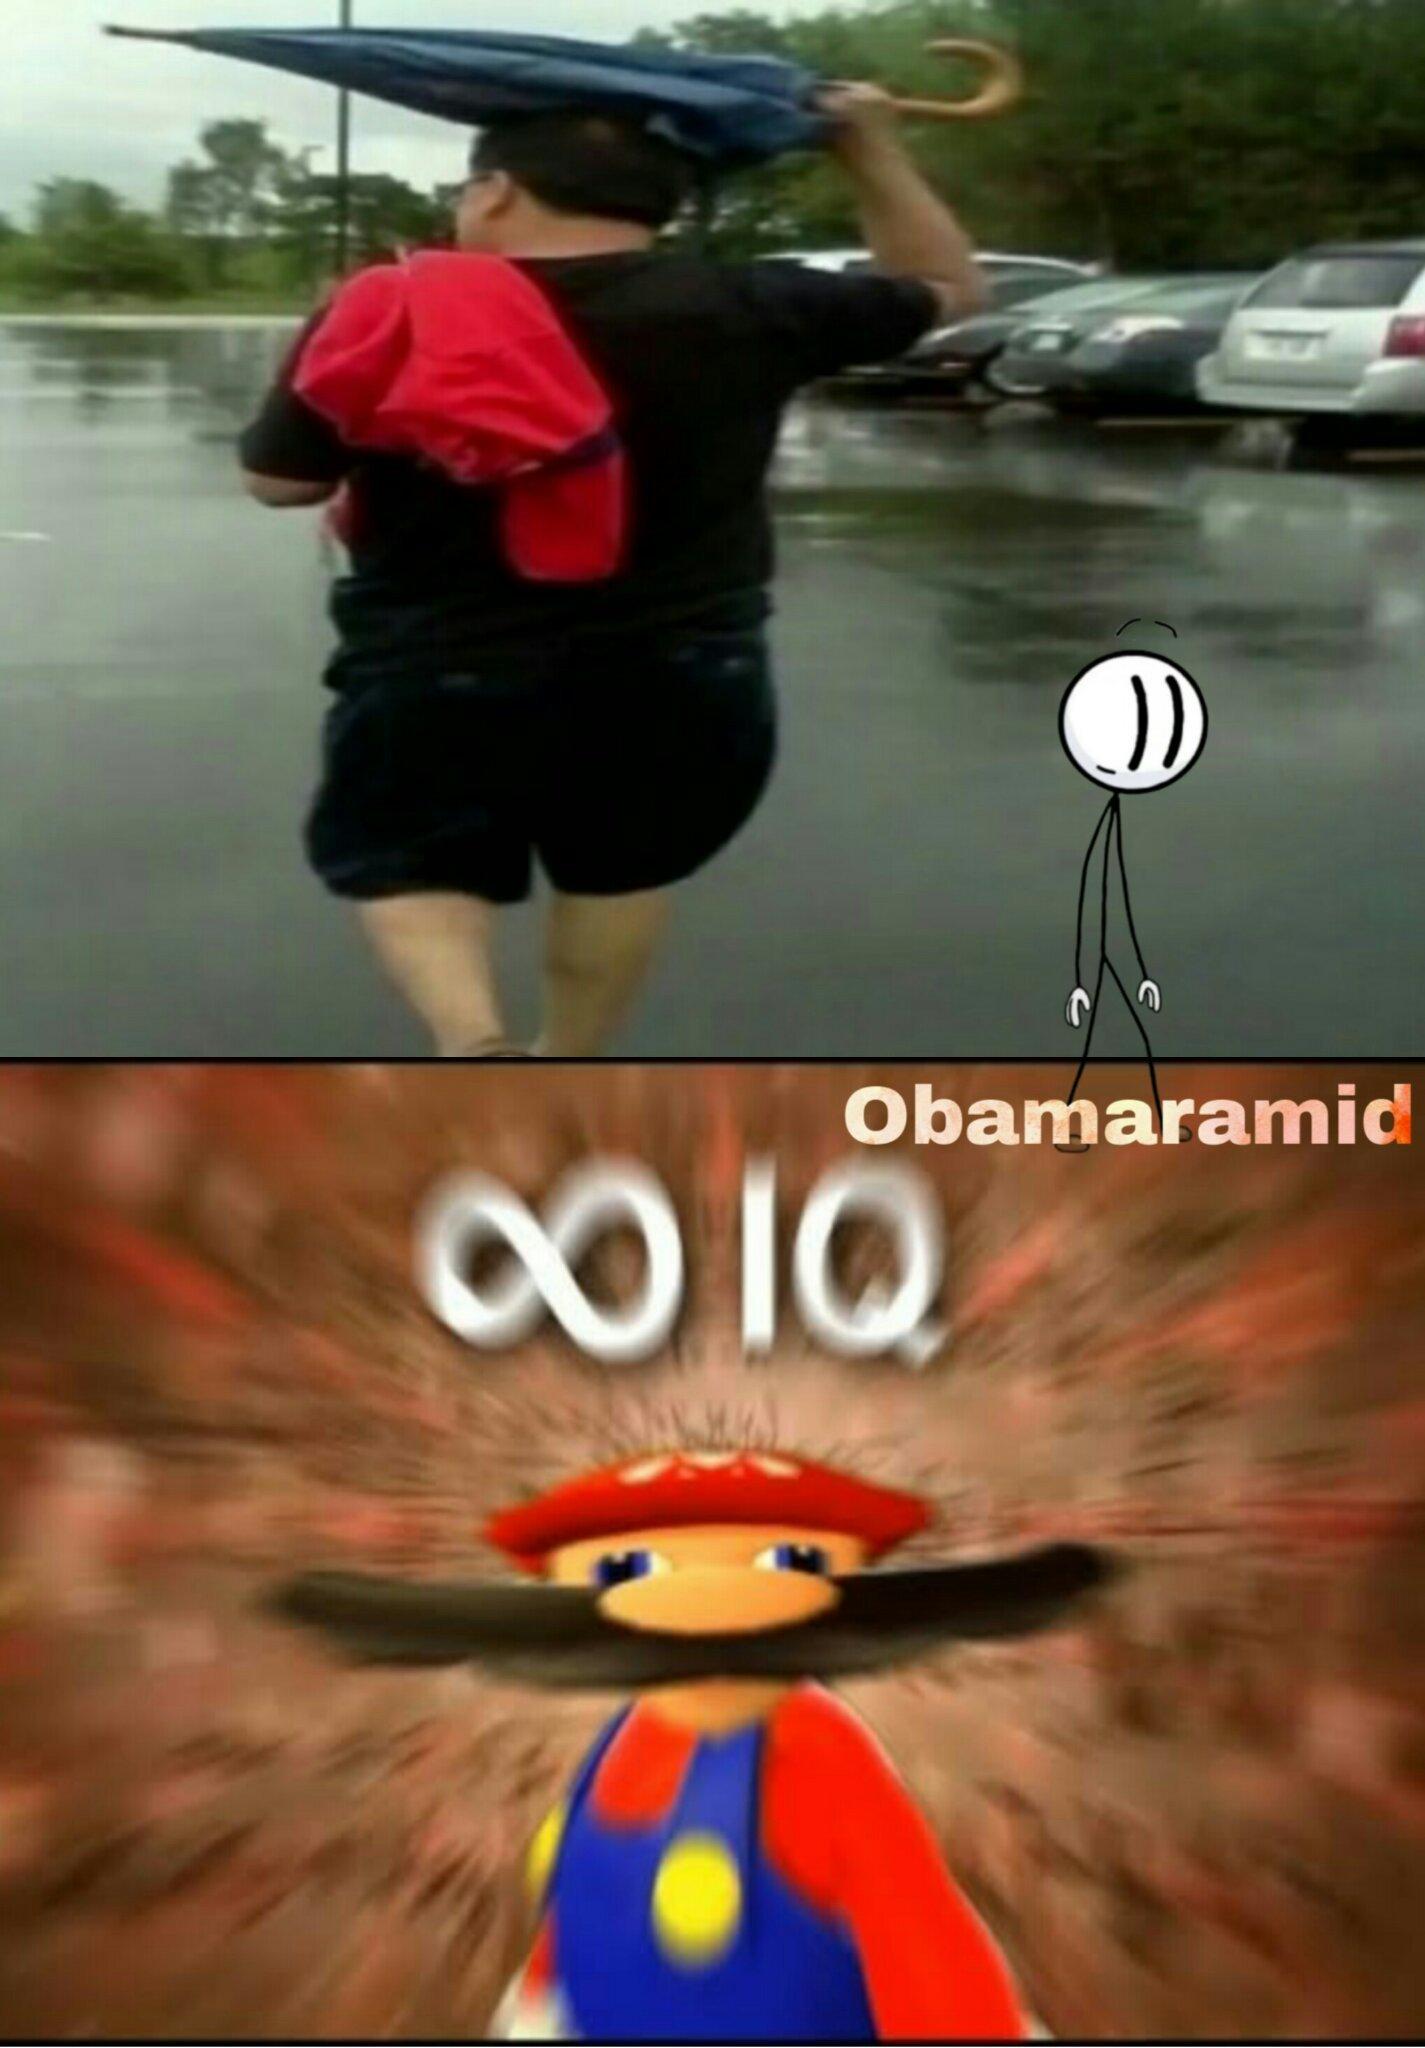 IQ 999 - meme